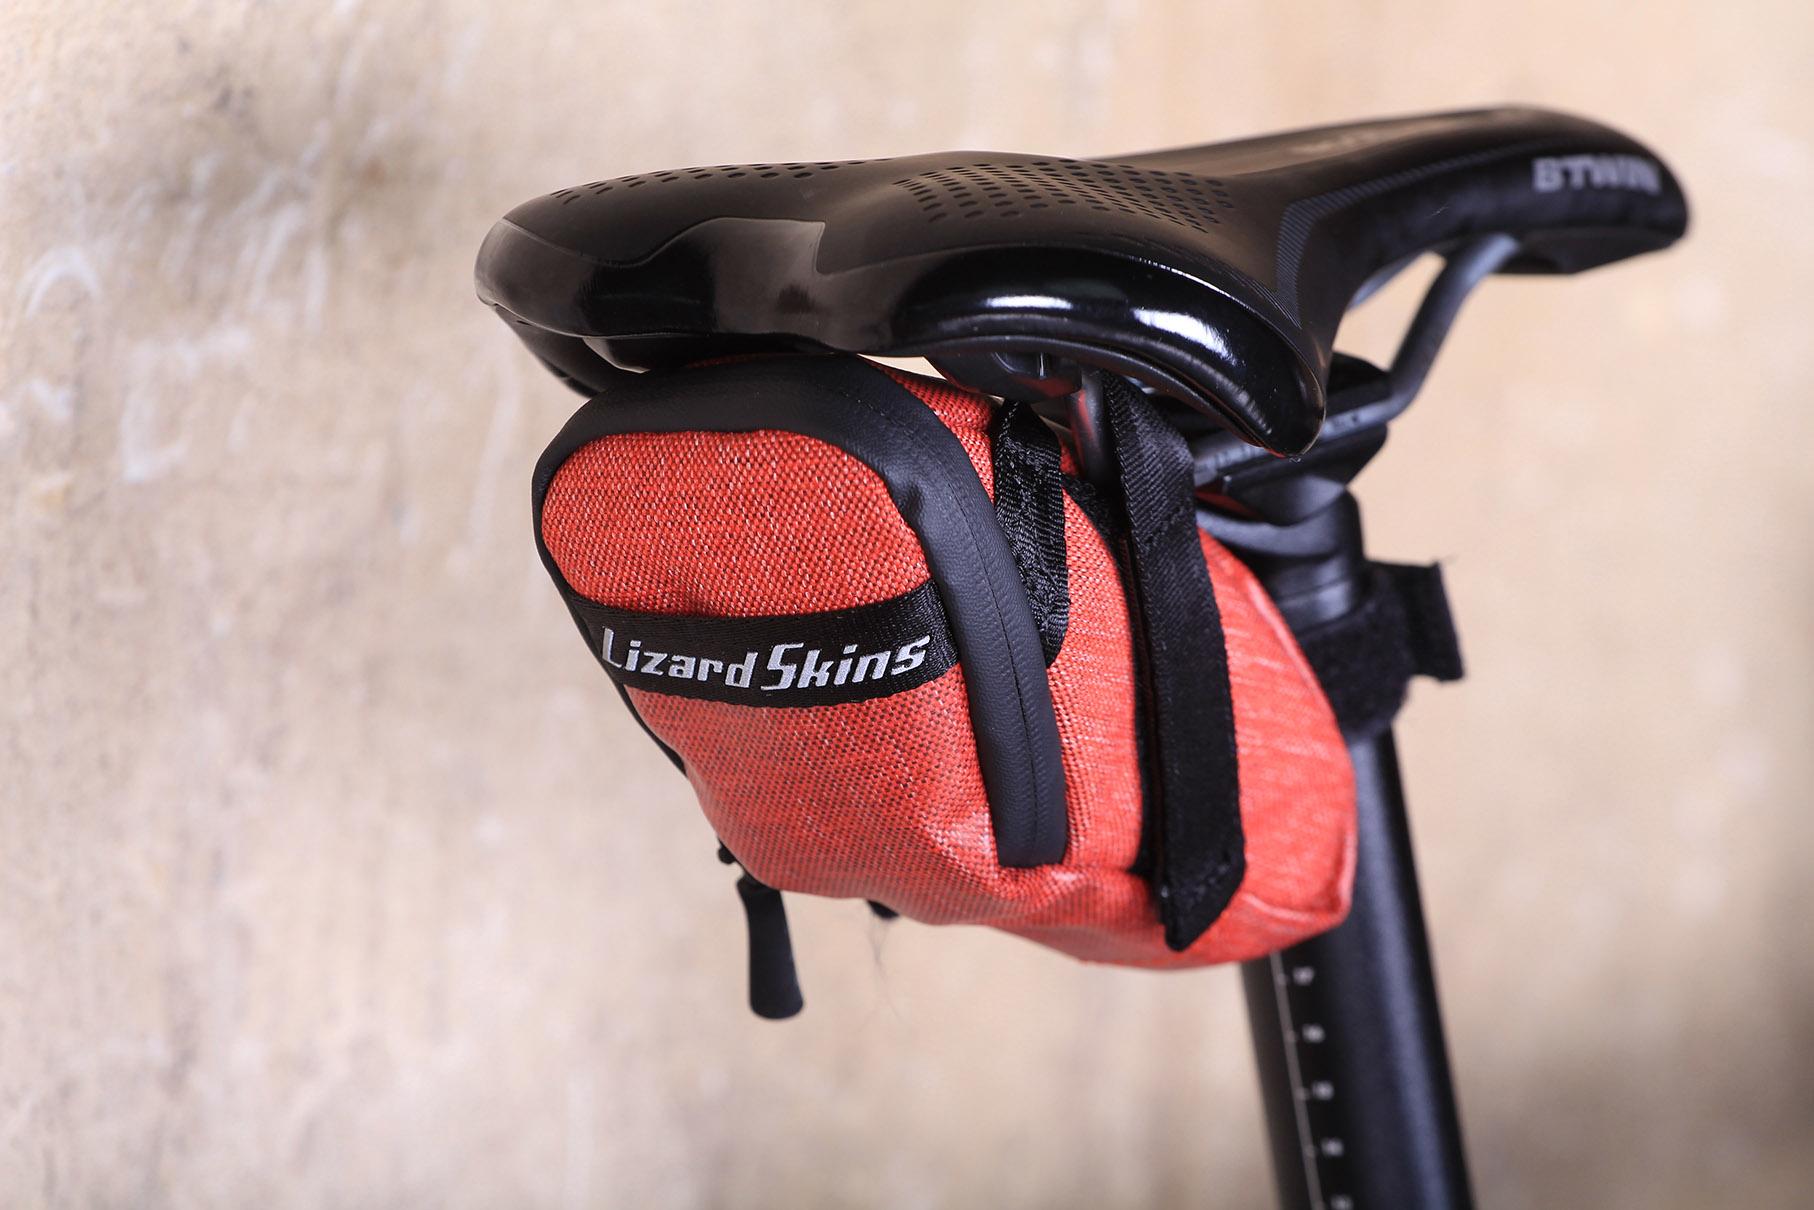 Biking Mountain Bike Lizard Skins Micro Cache Saddle Seat Bag Cycling